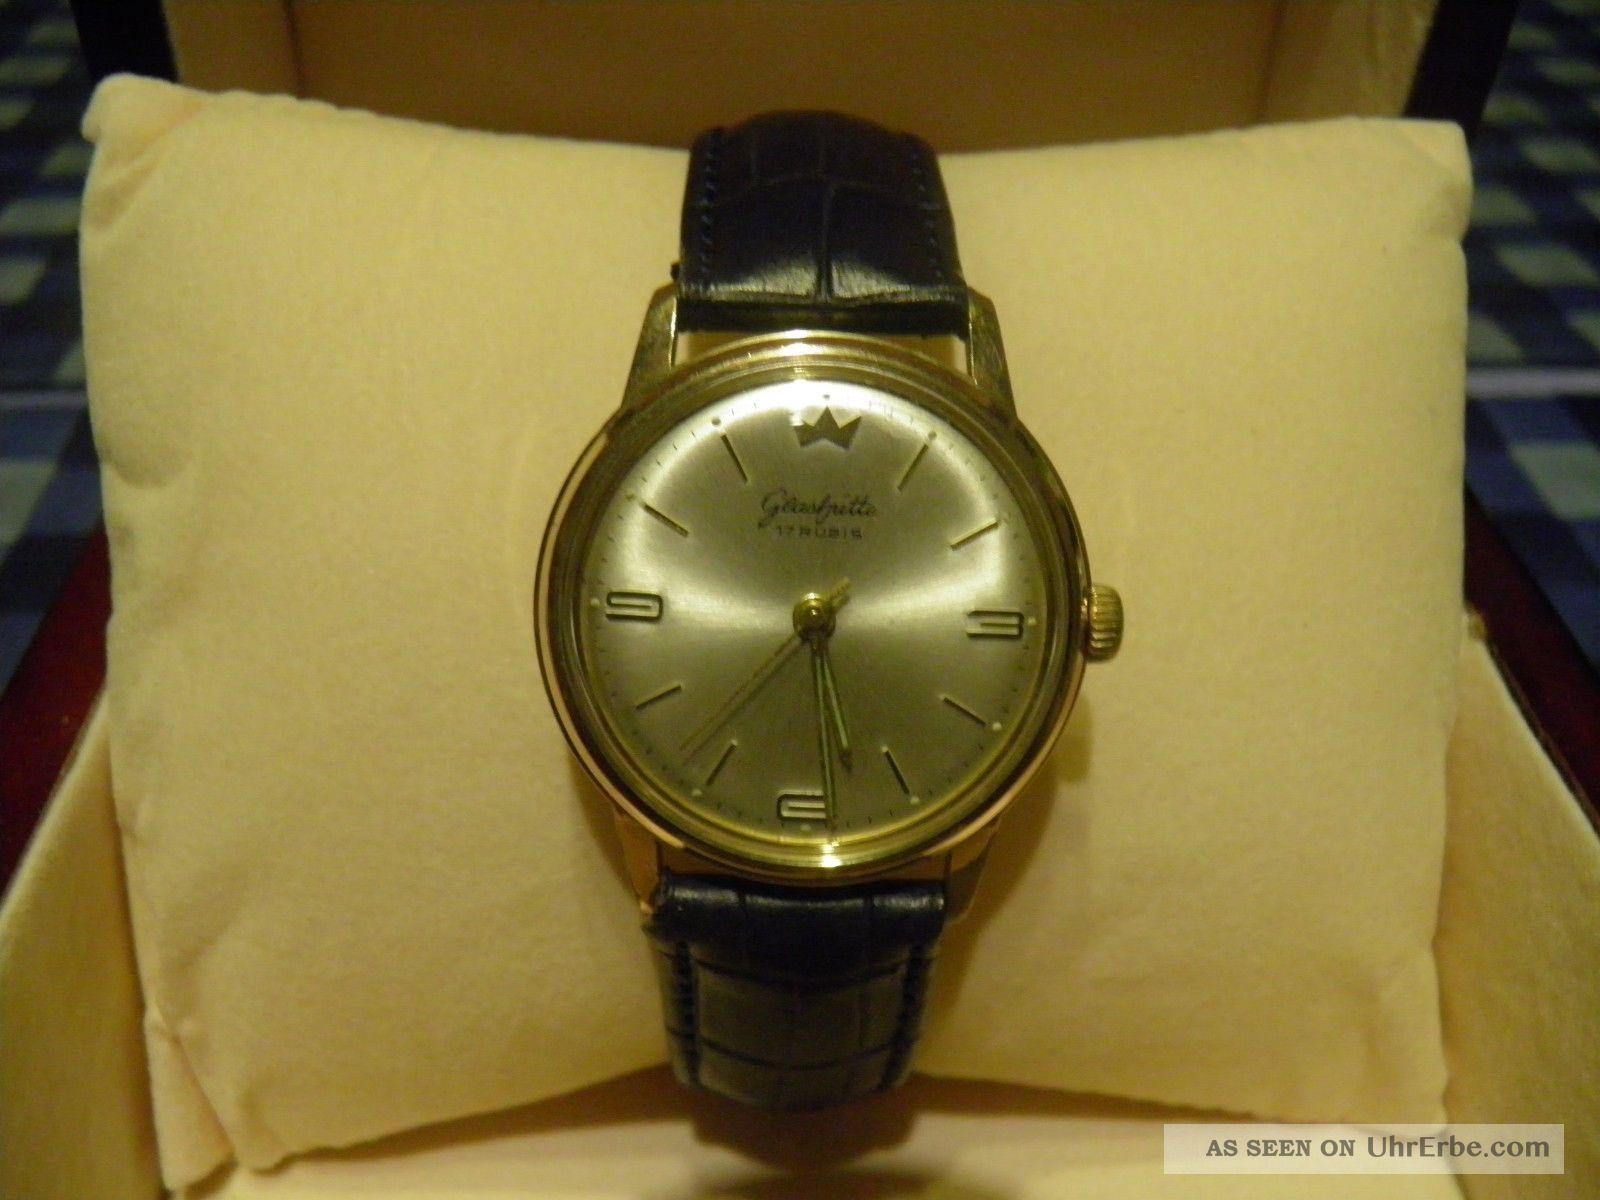 Glashütte Armbanduhr Handaufzug Armbanduhren Bild